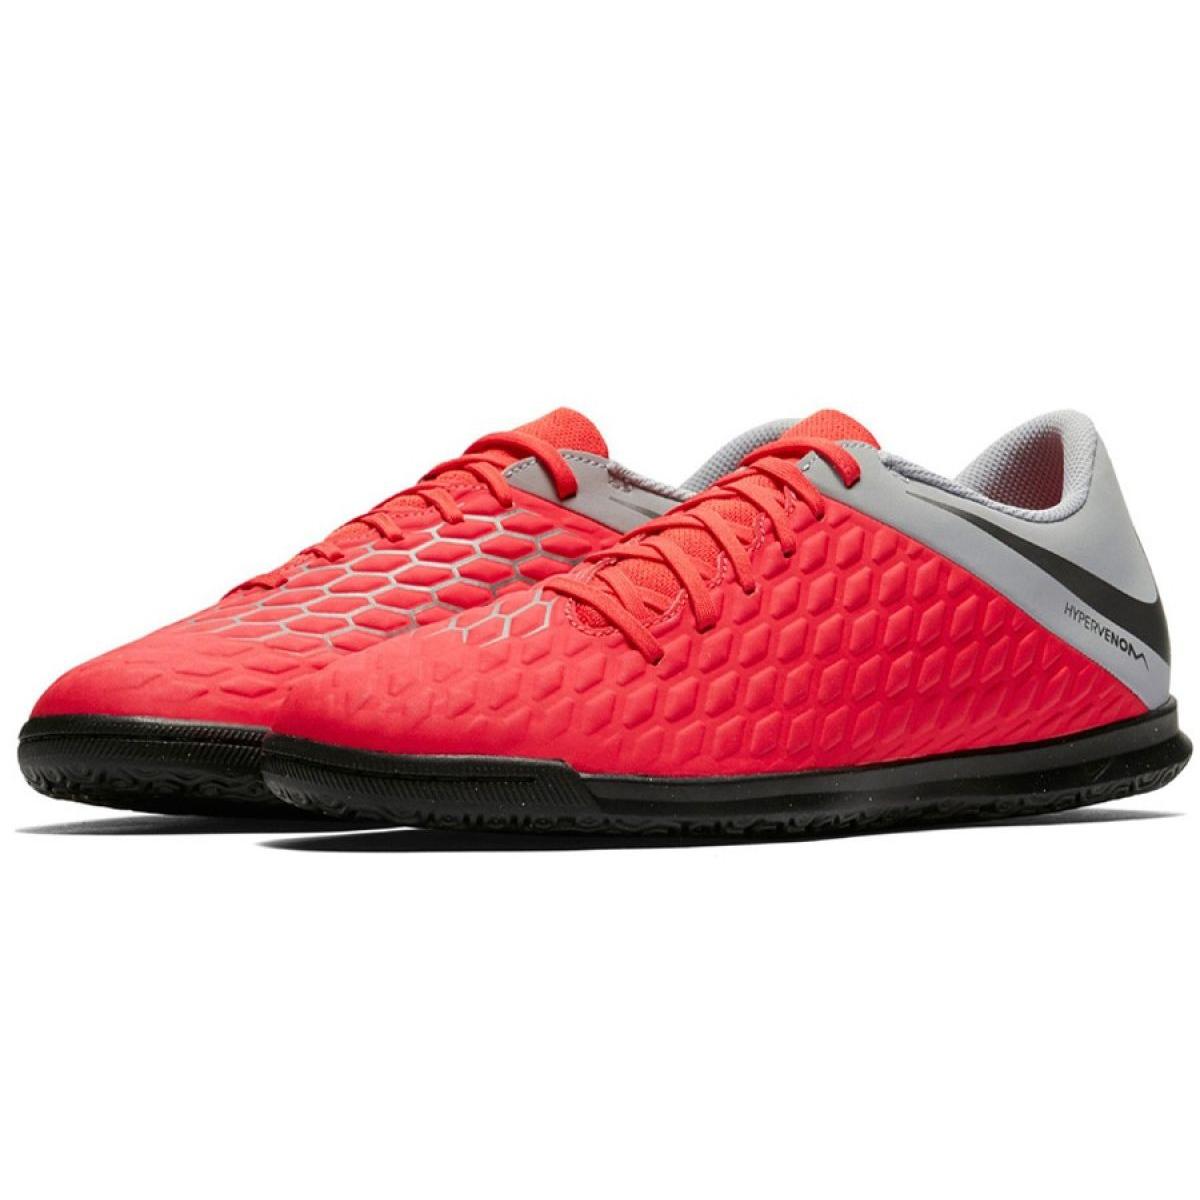 best loved ce71b fb191 Indoor shoes Nike Hypervenom PhantomX 3 Club Ic Jr AJ3789-600